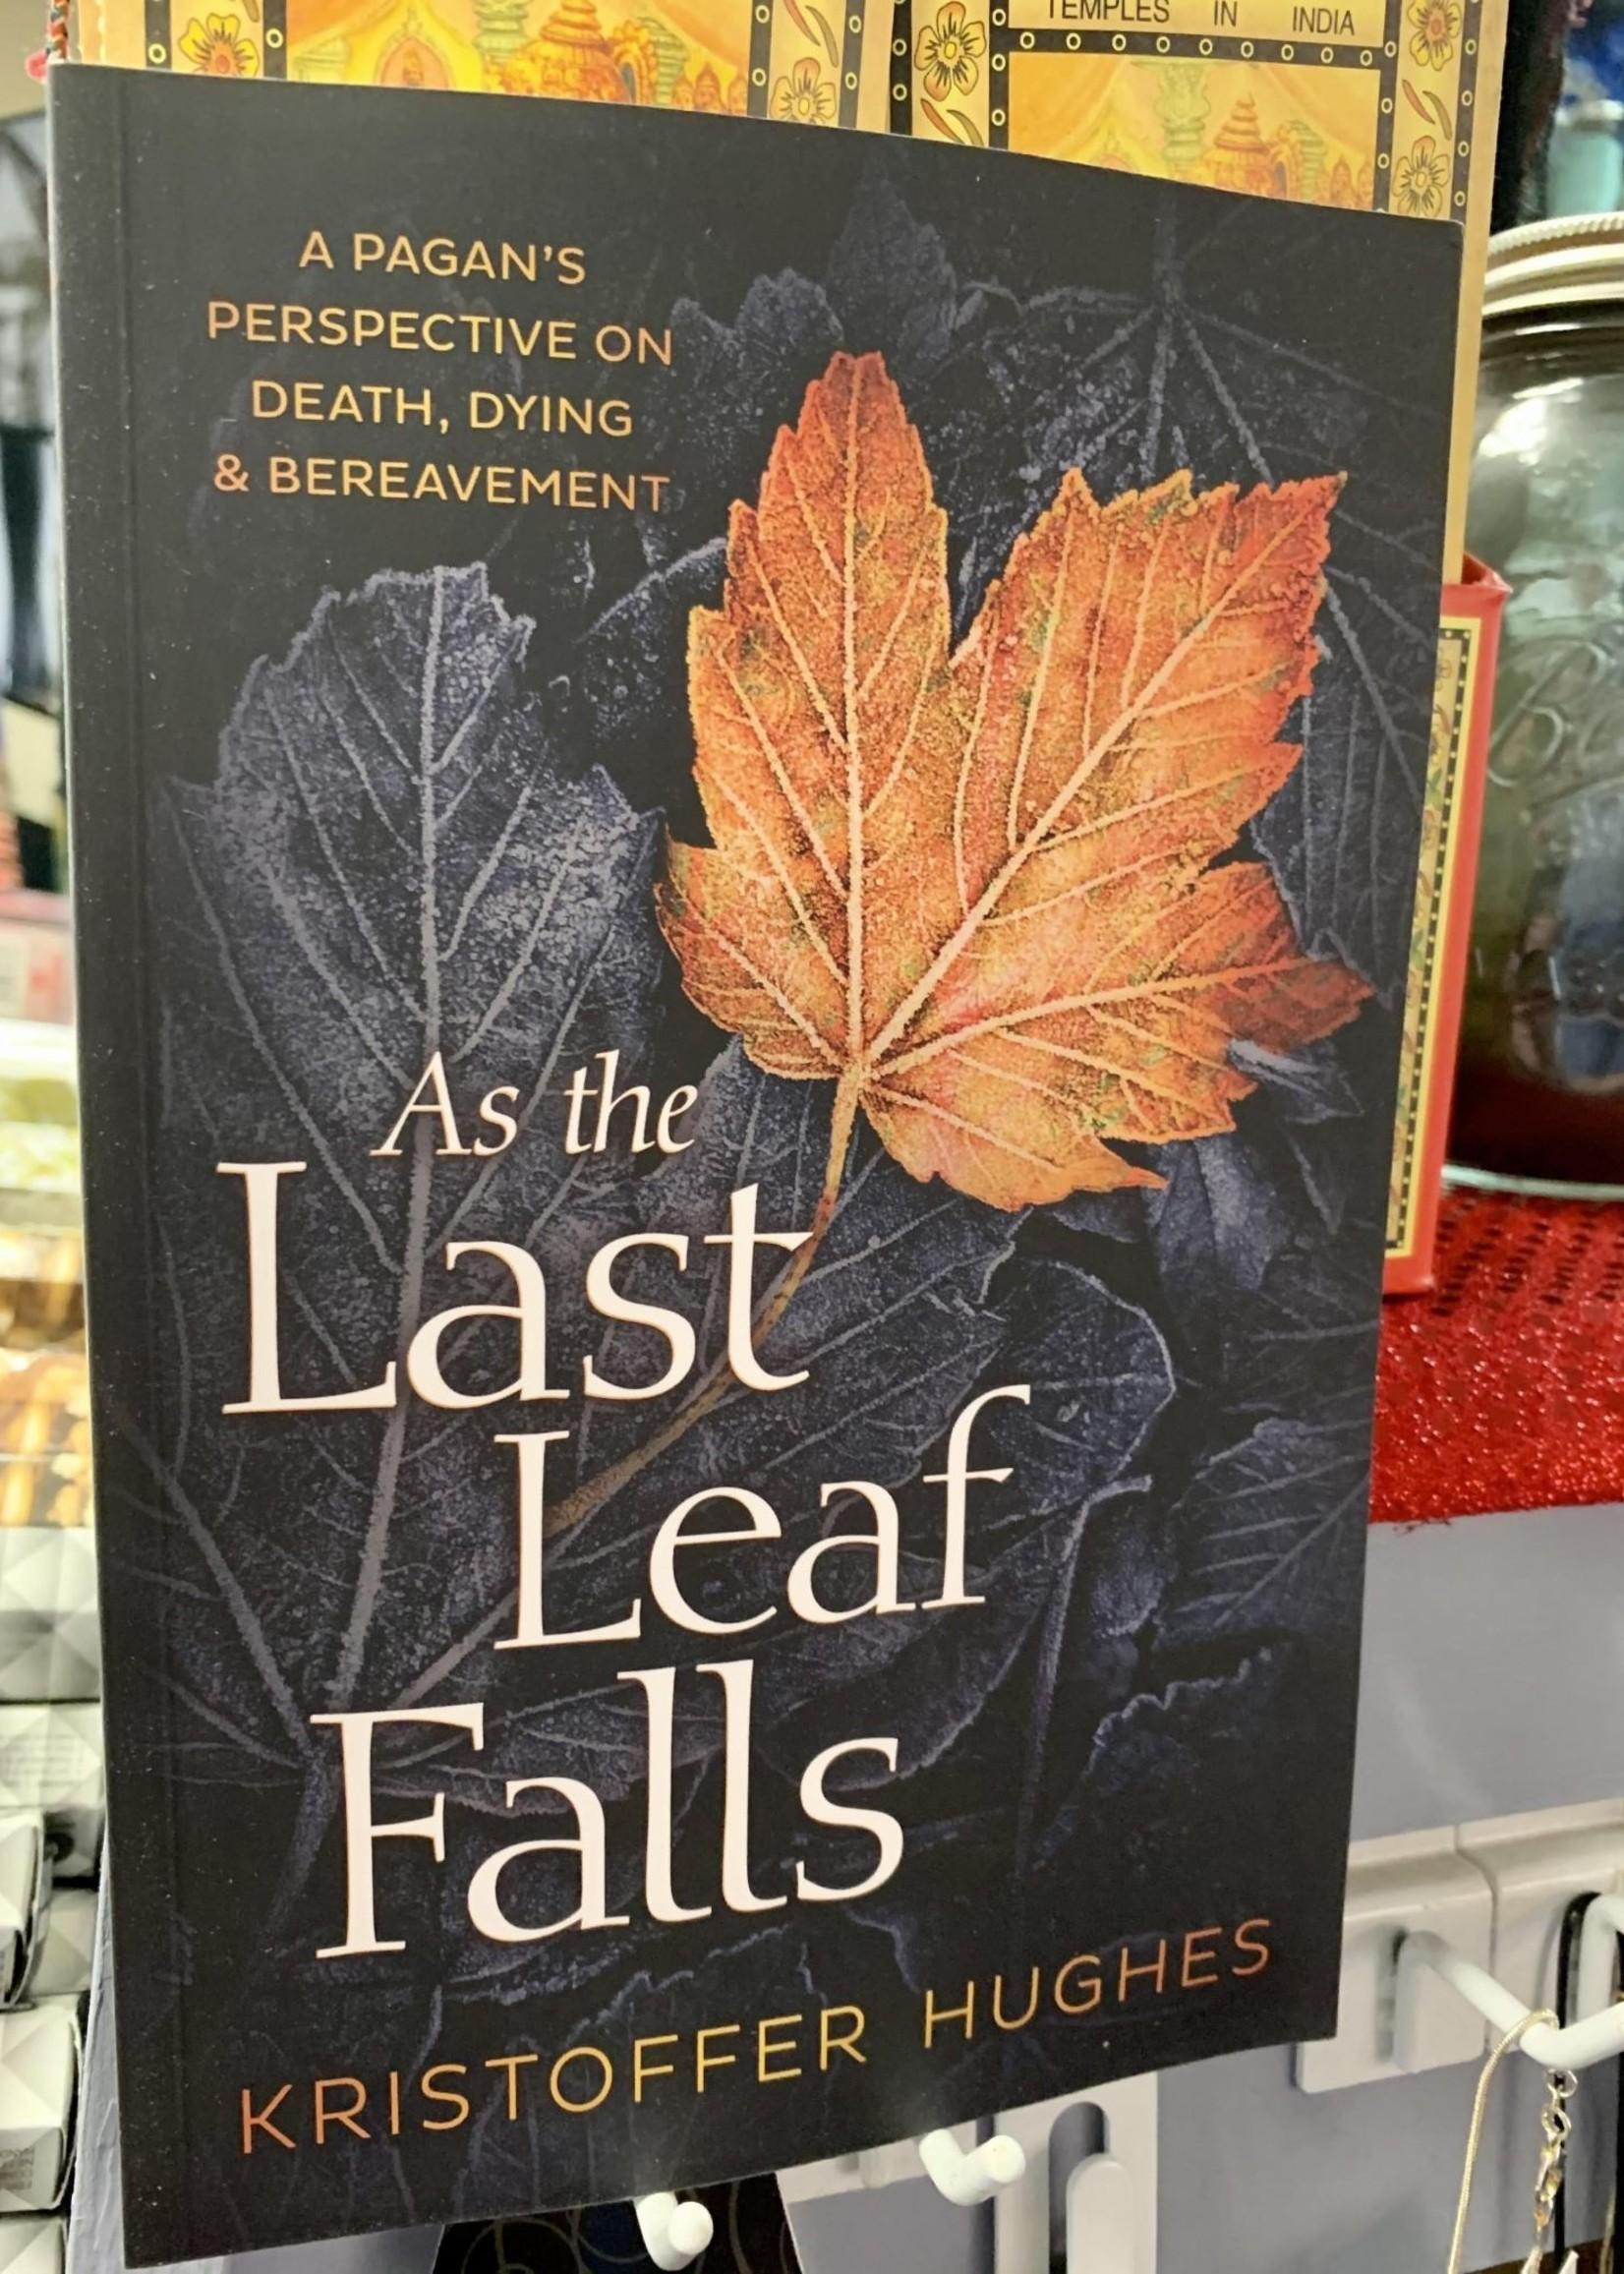 As the Last Leaf Falls - BY KRISTOFFER HUGHES